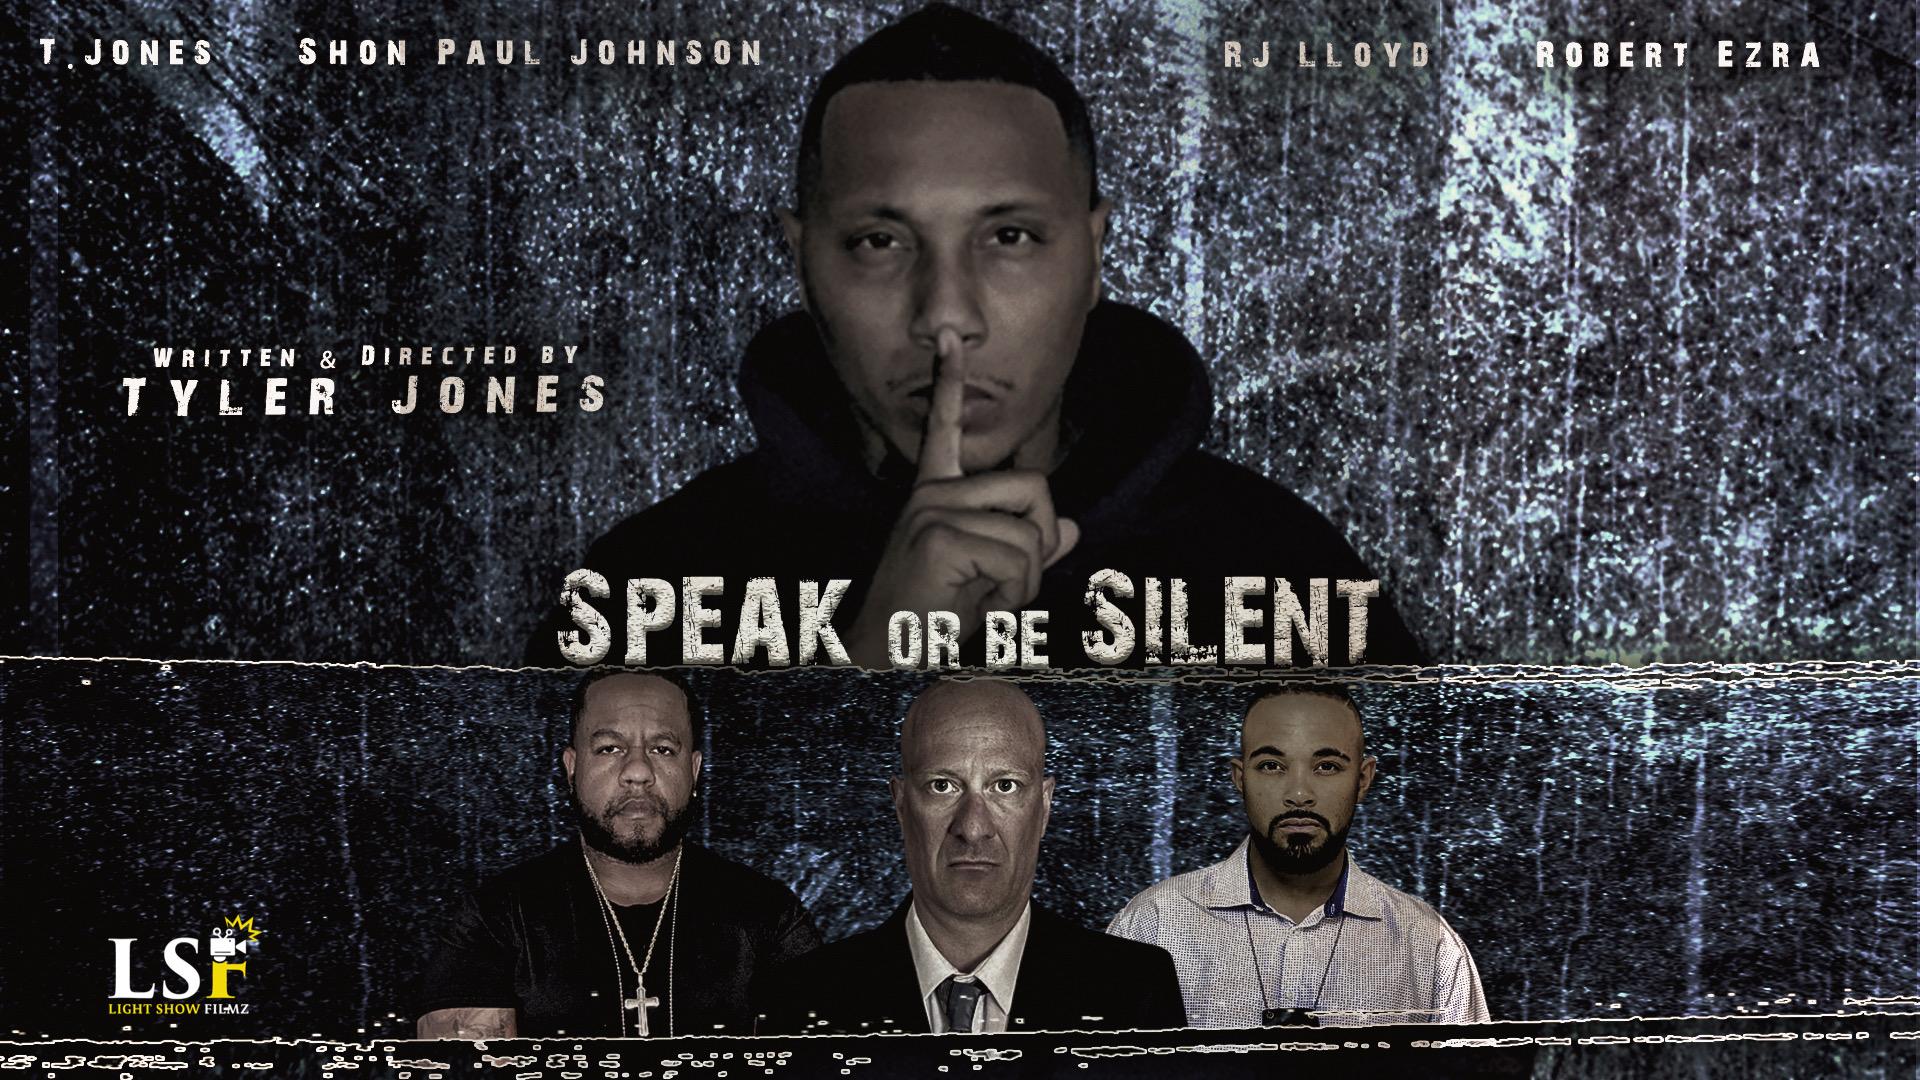 Speak or be Silent